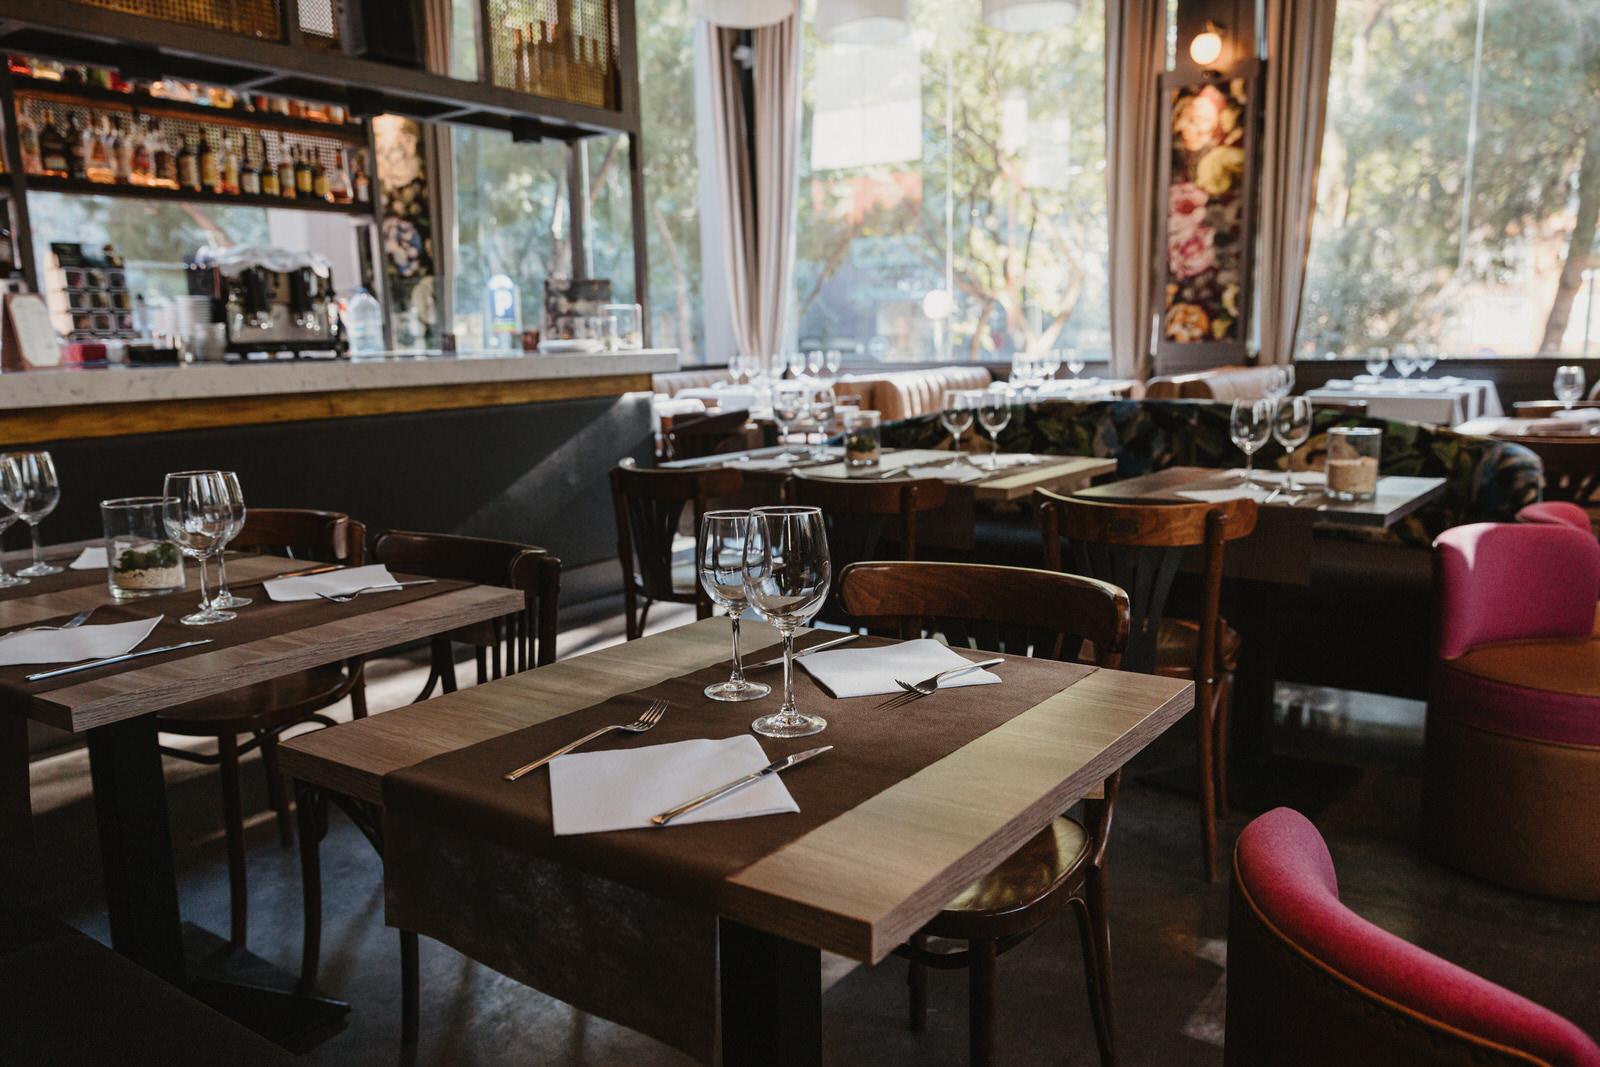 Sesión fotos gastronomía restaurante lifestyle en Barcelona. Fotógrafo restaurantes y empresa Barcelona